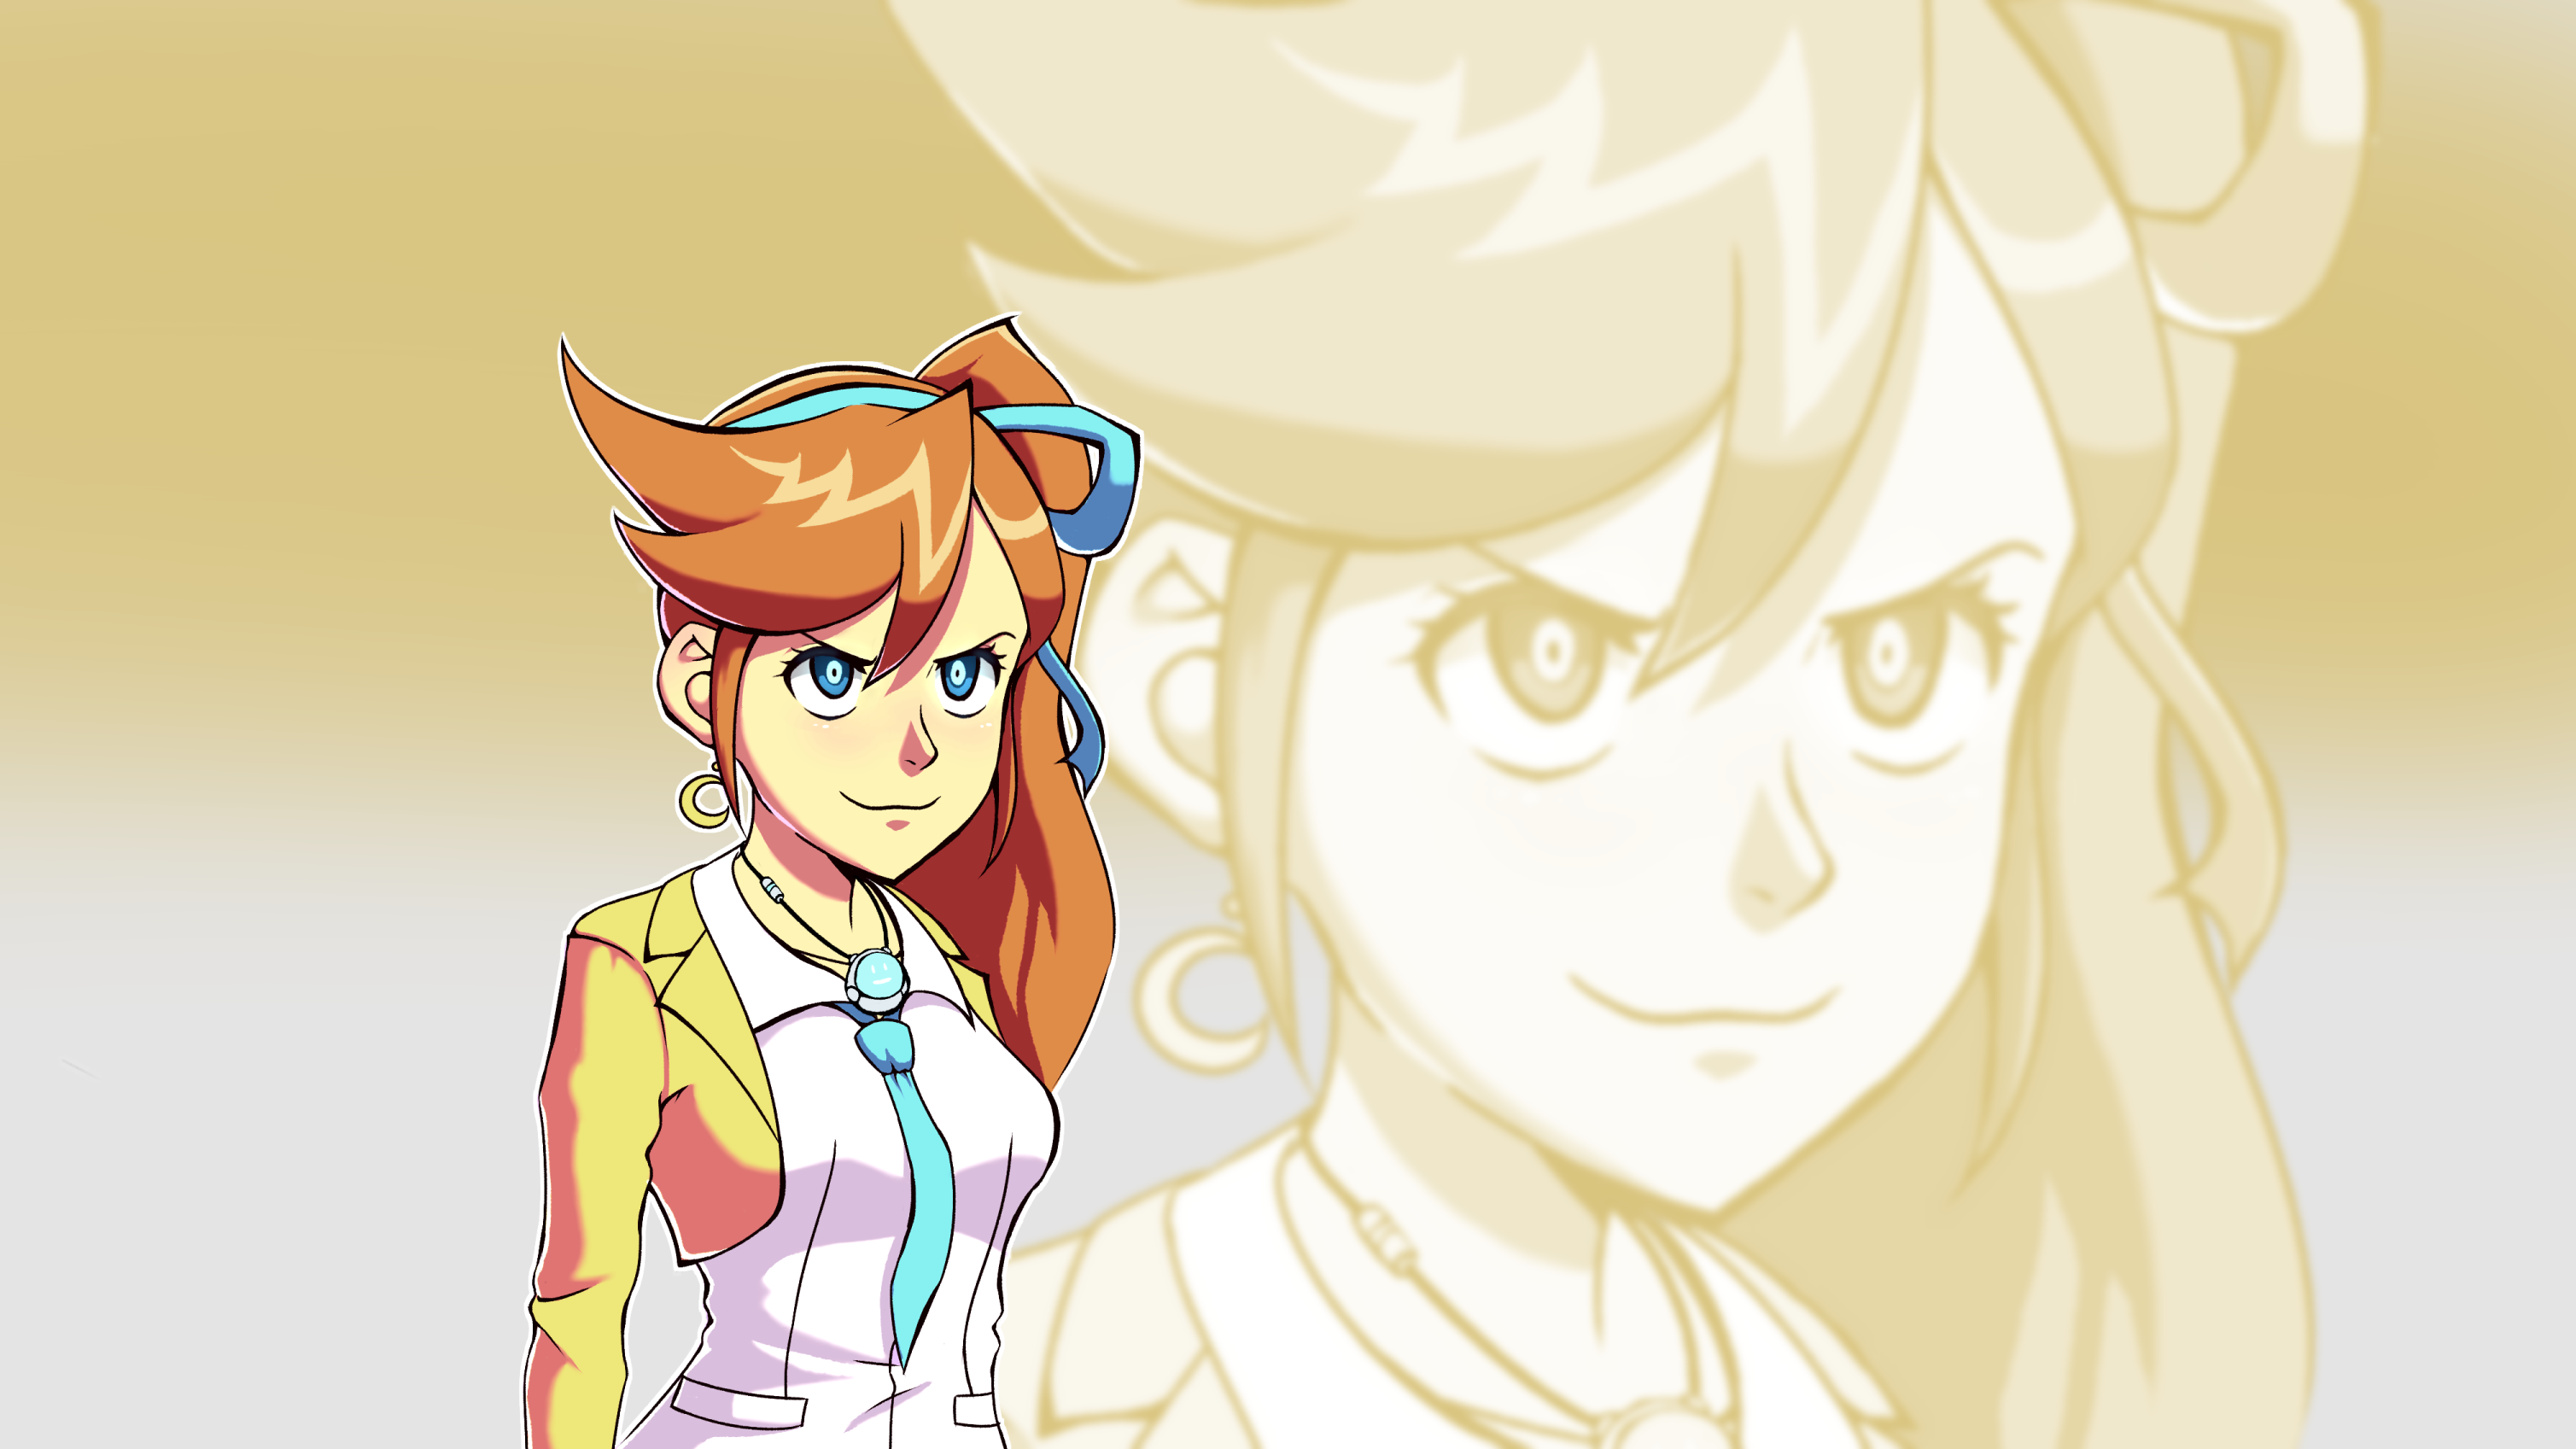 Athena Cykes